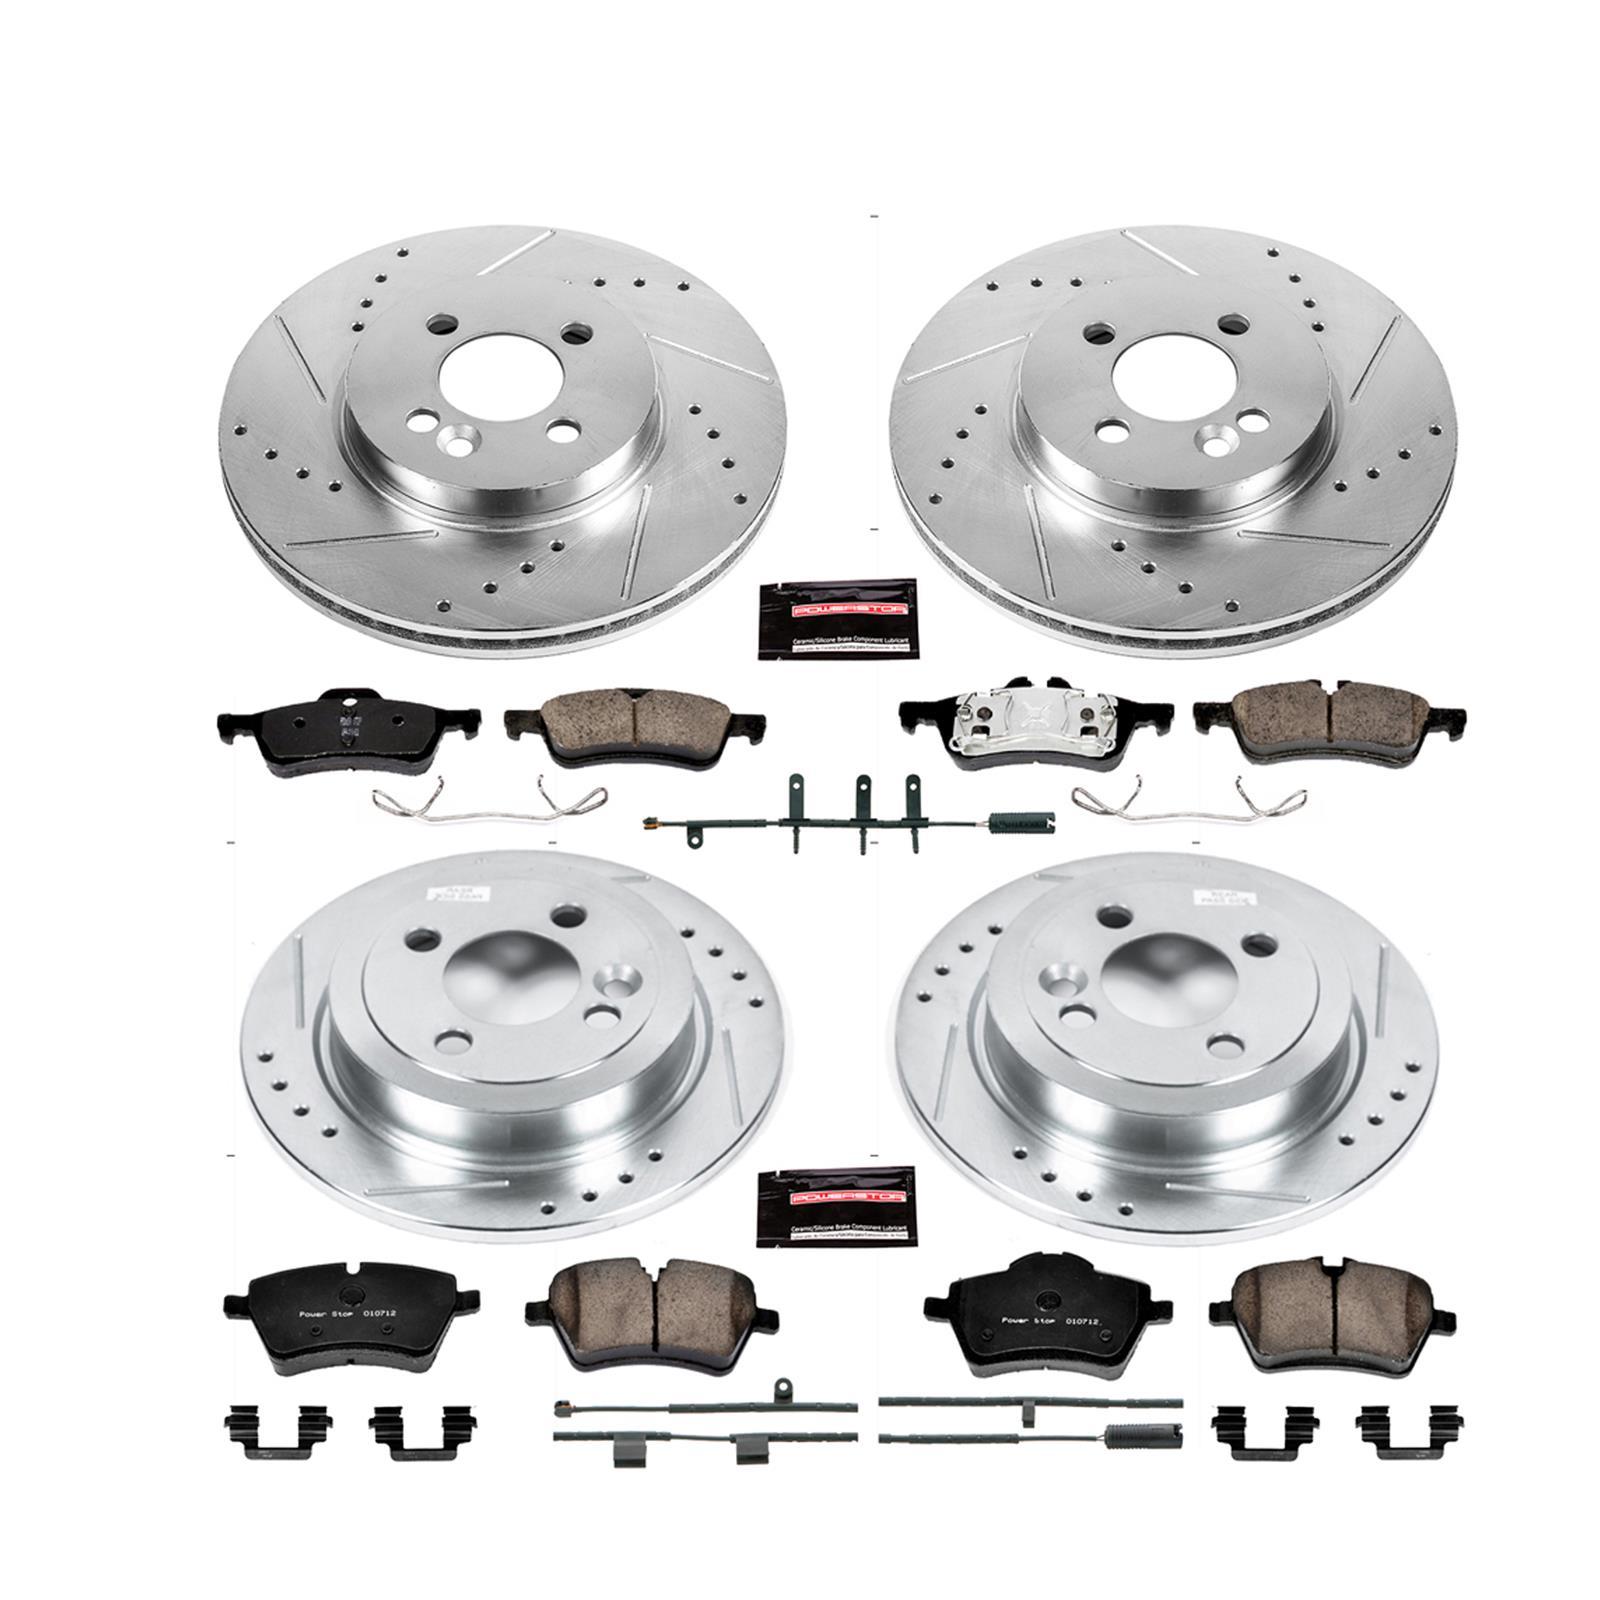 Power Stop K4033 Front /& Rear Brake Kit with Drilled//Slotted Brake Rotors and Z23 Evolution Ceramic Brake Pads